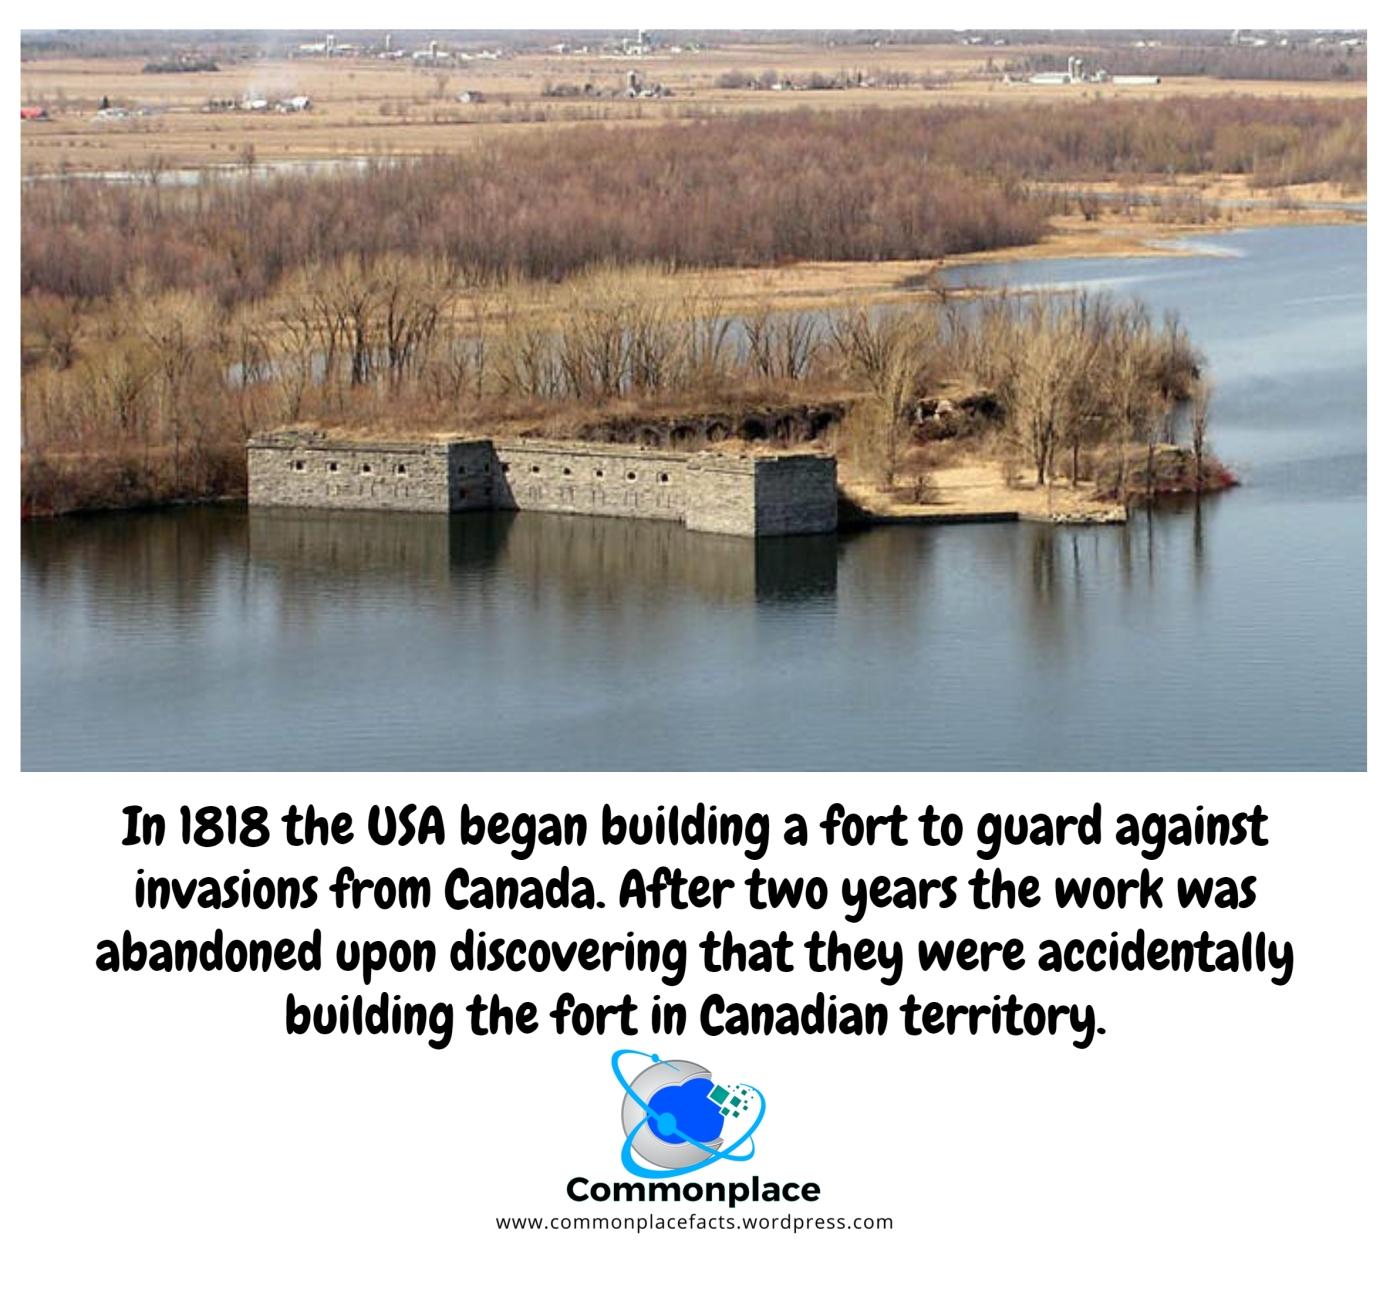 #FortBlunder #Canada #Warof1812 #FortMontgomery #Oops